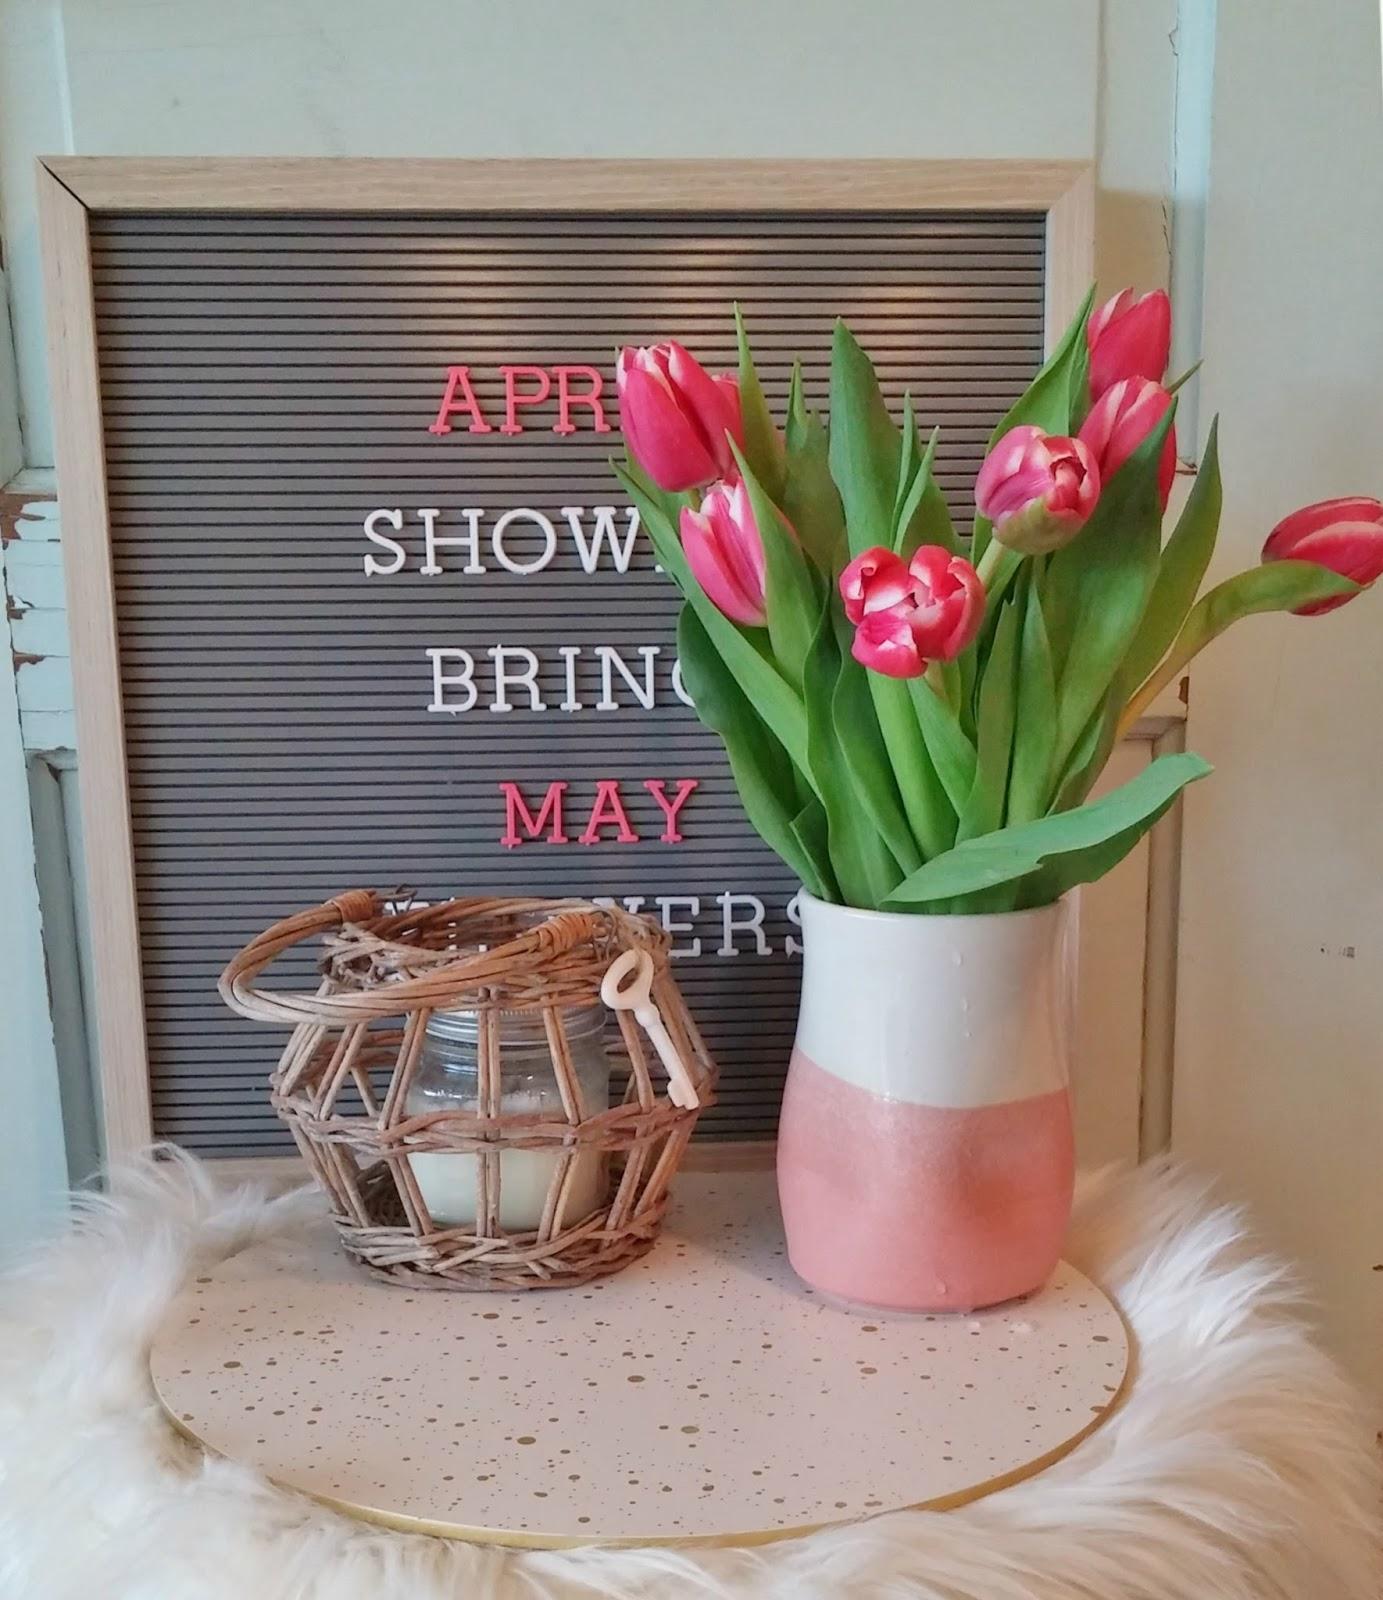 Spring letter board